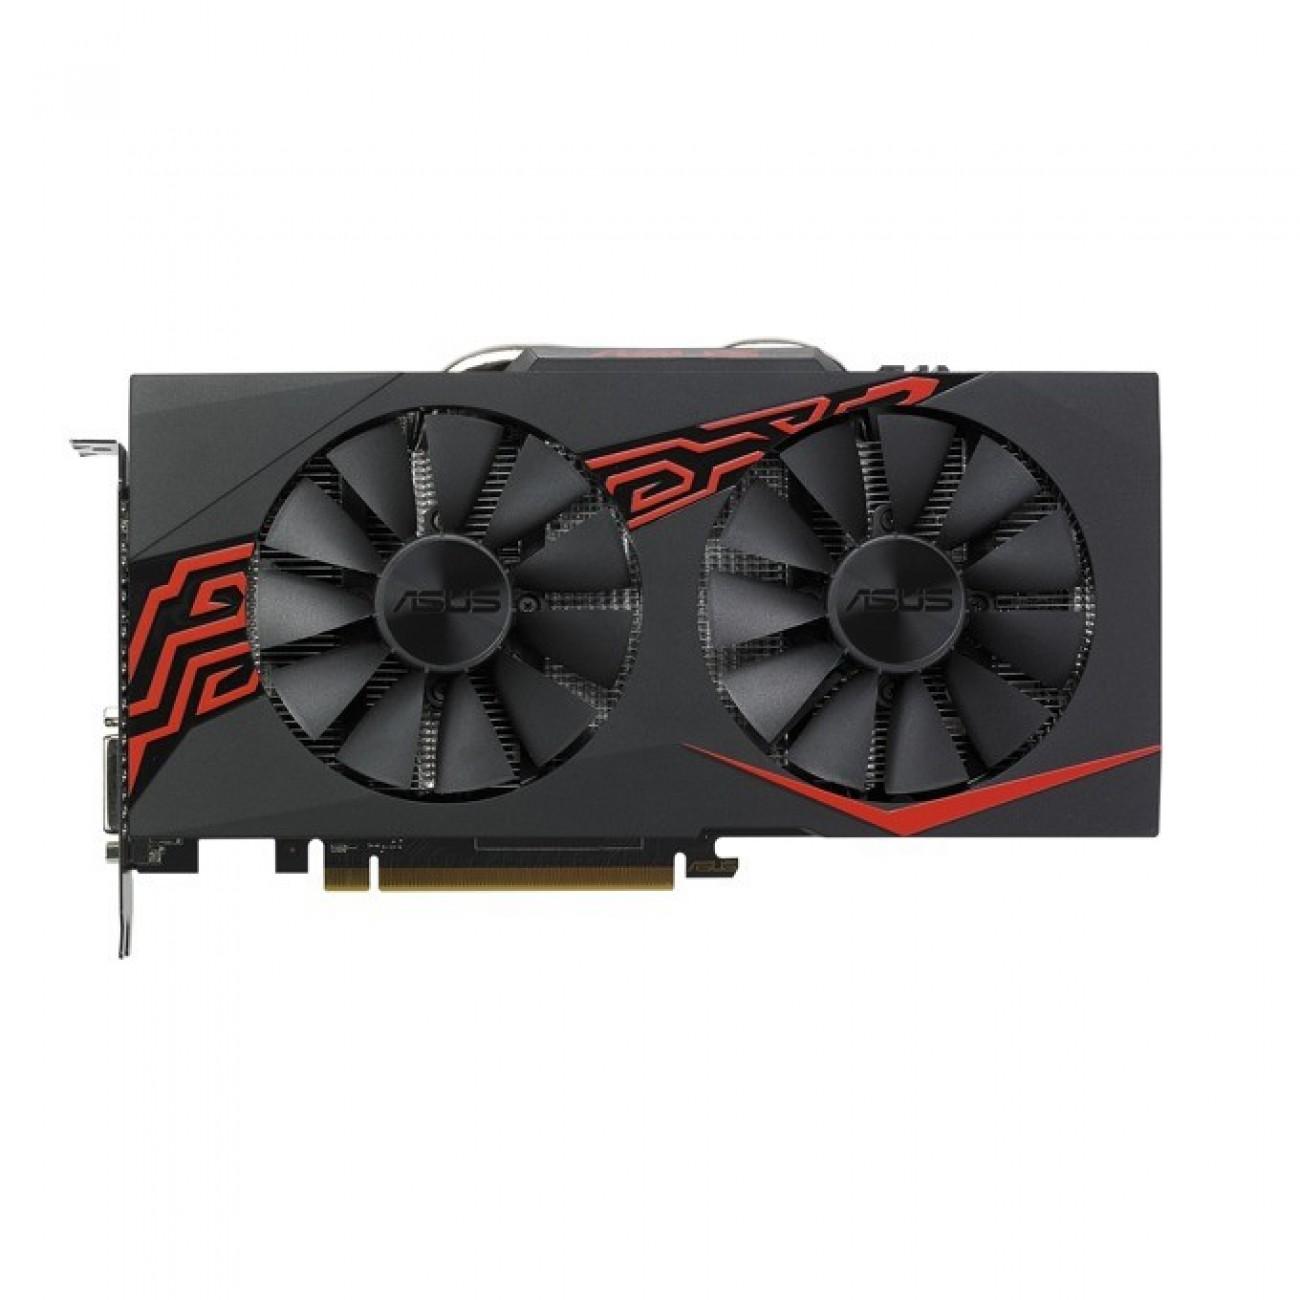 Видео карта AMD Radeon RX 470, 4GB, Asus MINING-RX470-4G-LED, PCI-E 3.0, GDDR5, 256 bit, DVI, за добив на криптовалути в Видео карти -  | Alleop